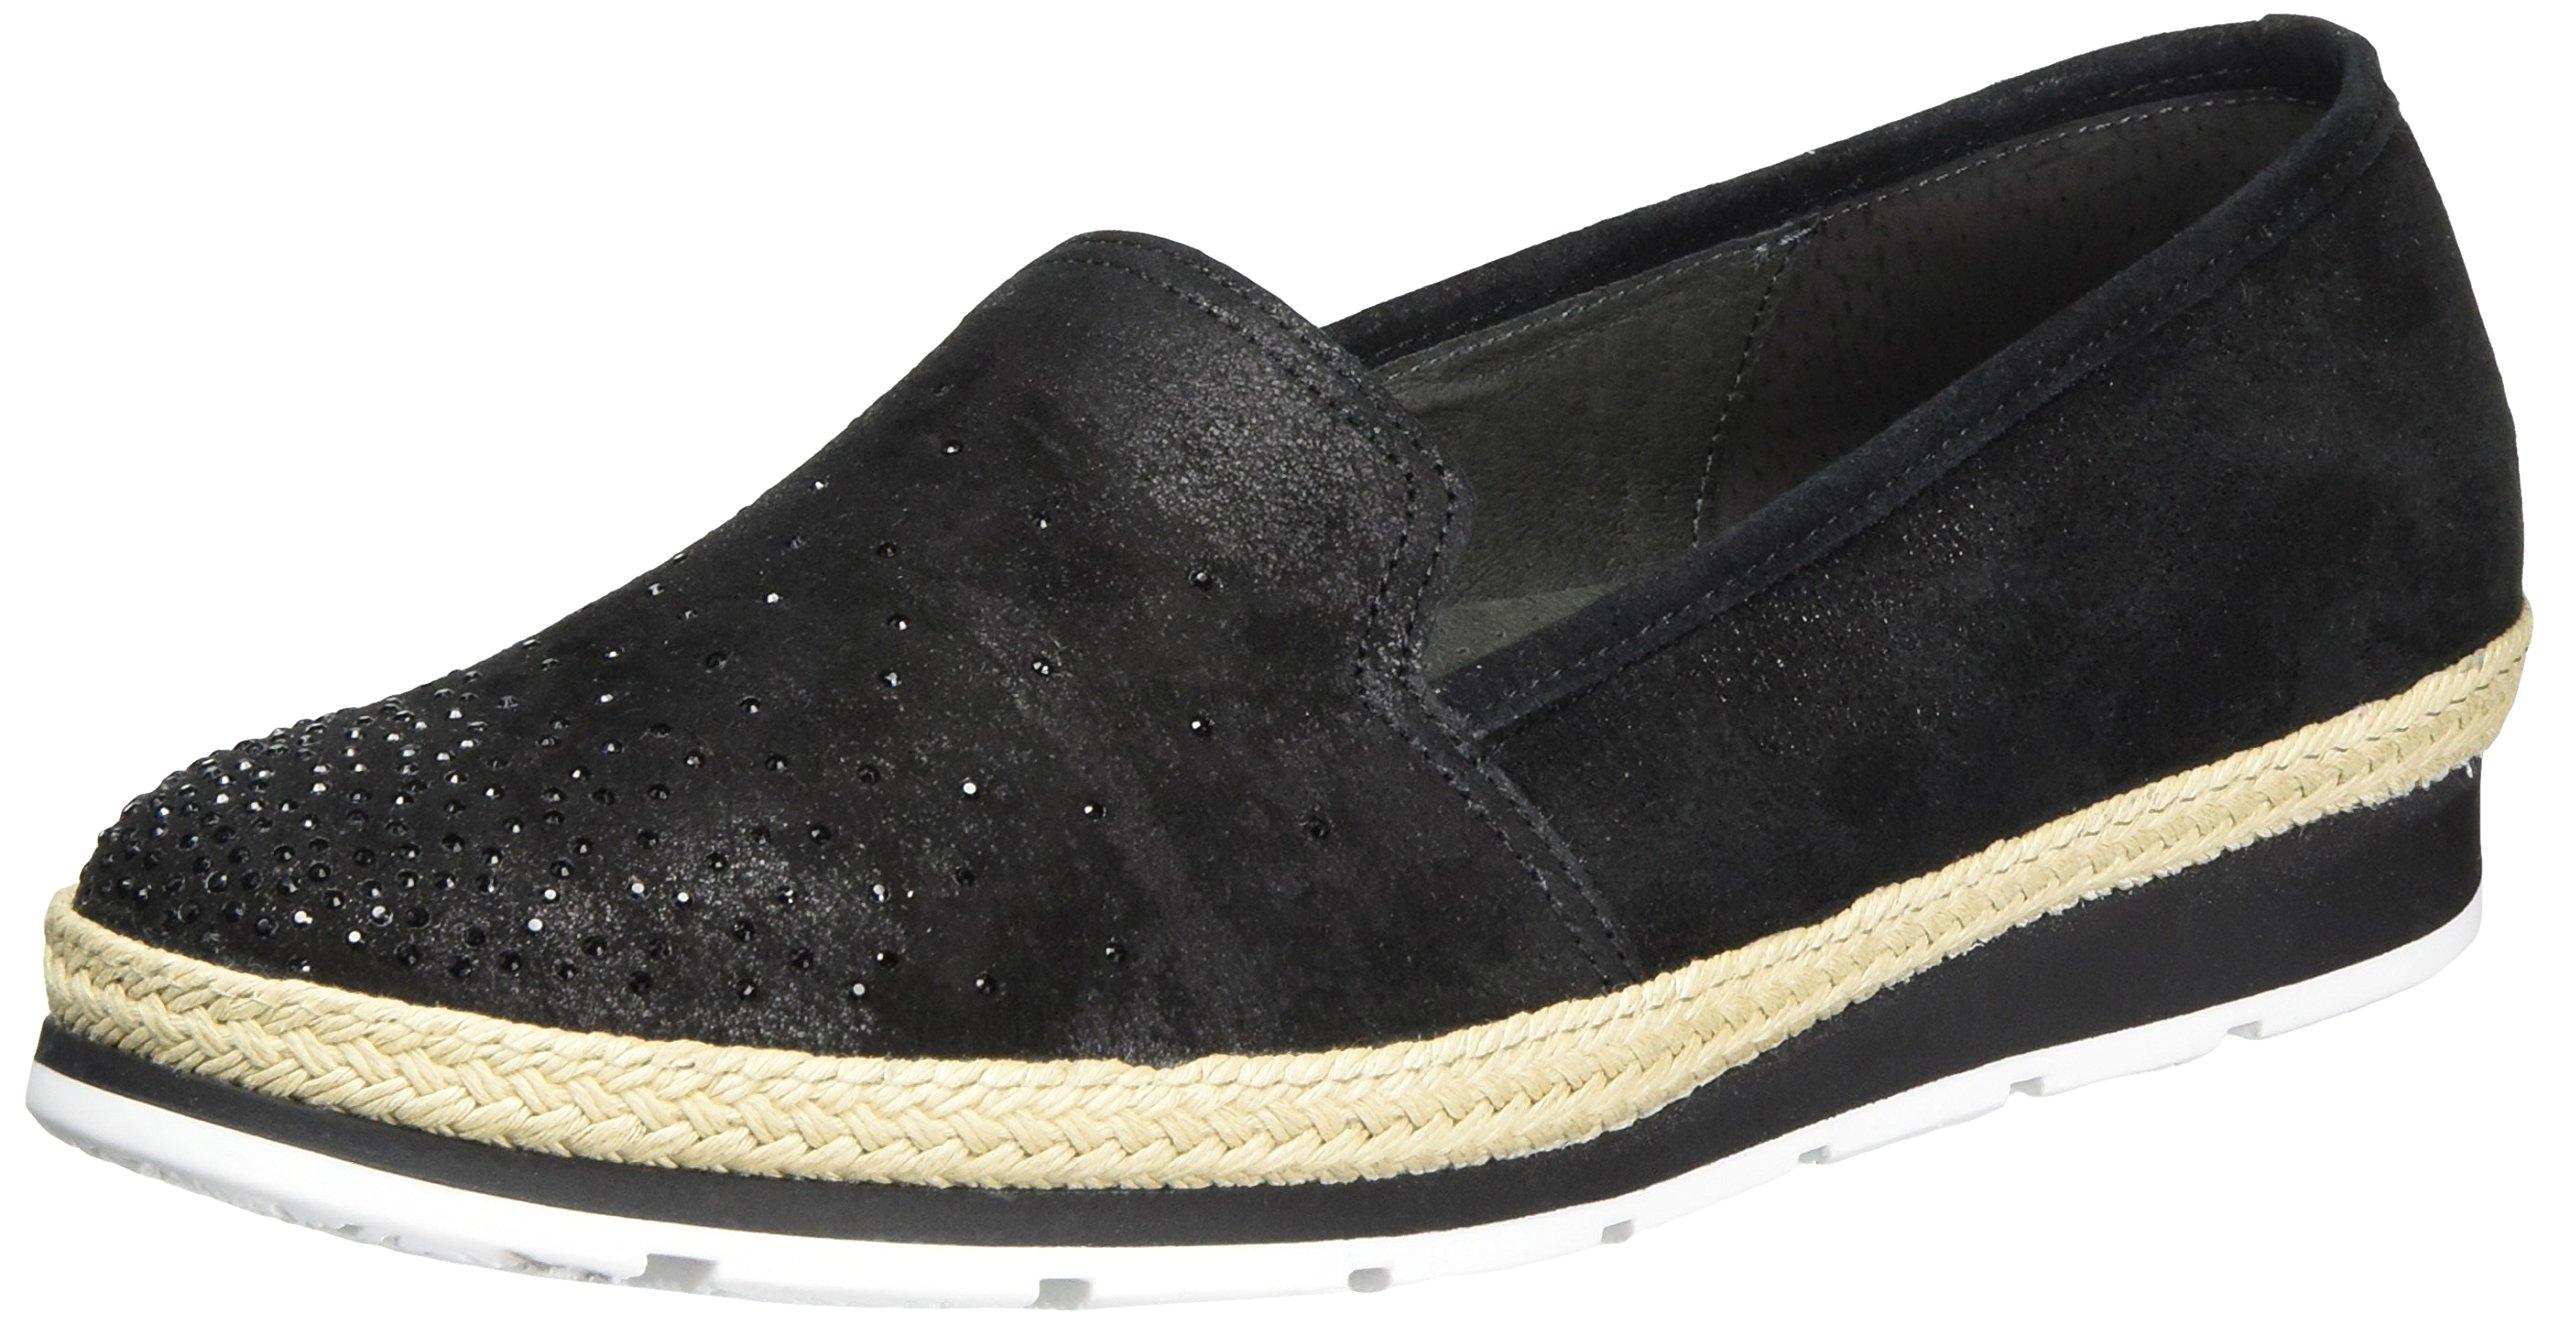 ComfortBallerines Jute40 Eu FemmeNoirschwarz Gabor Shoes 5RA4Lq3j